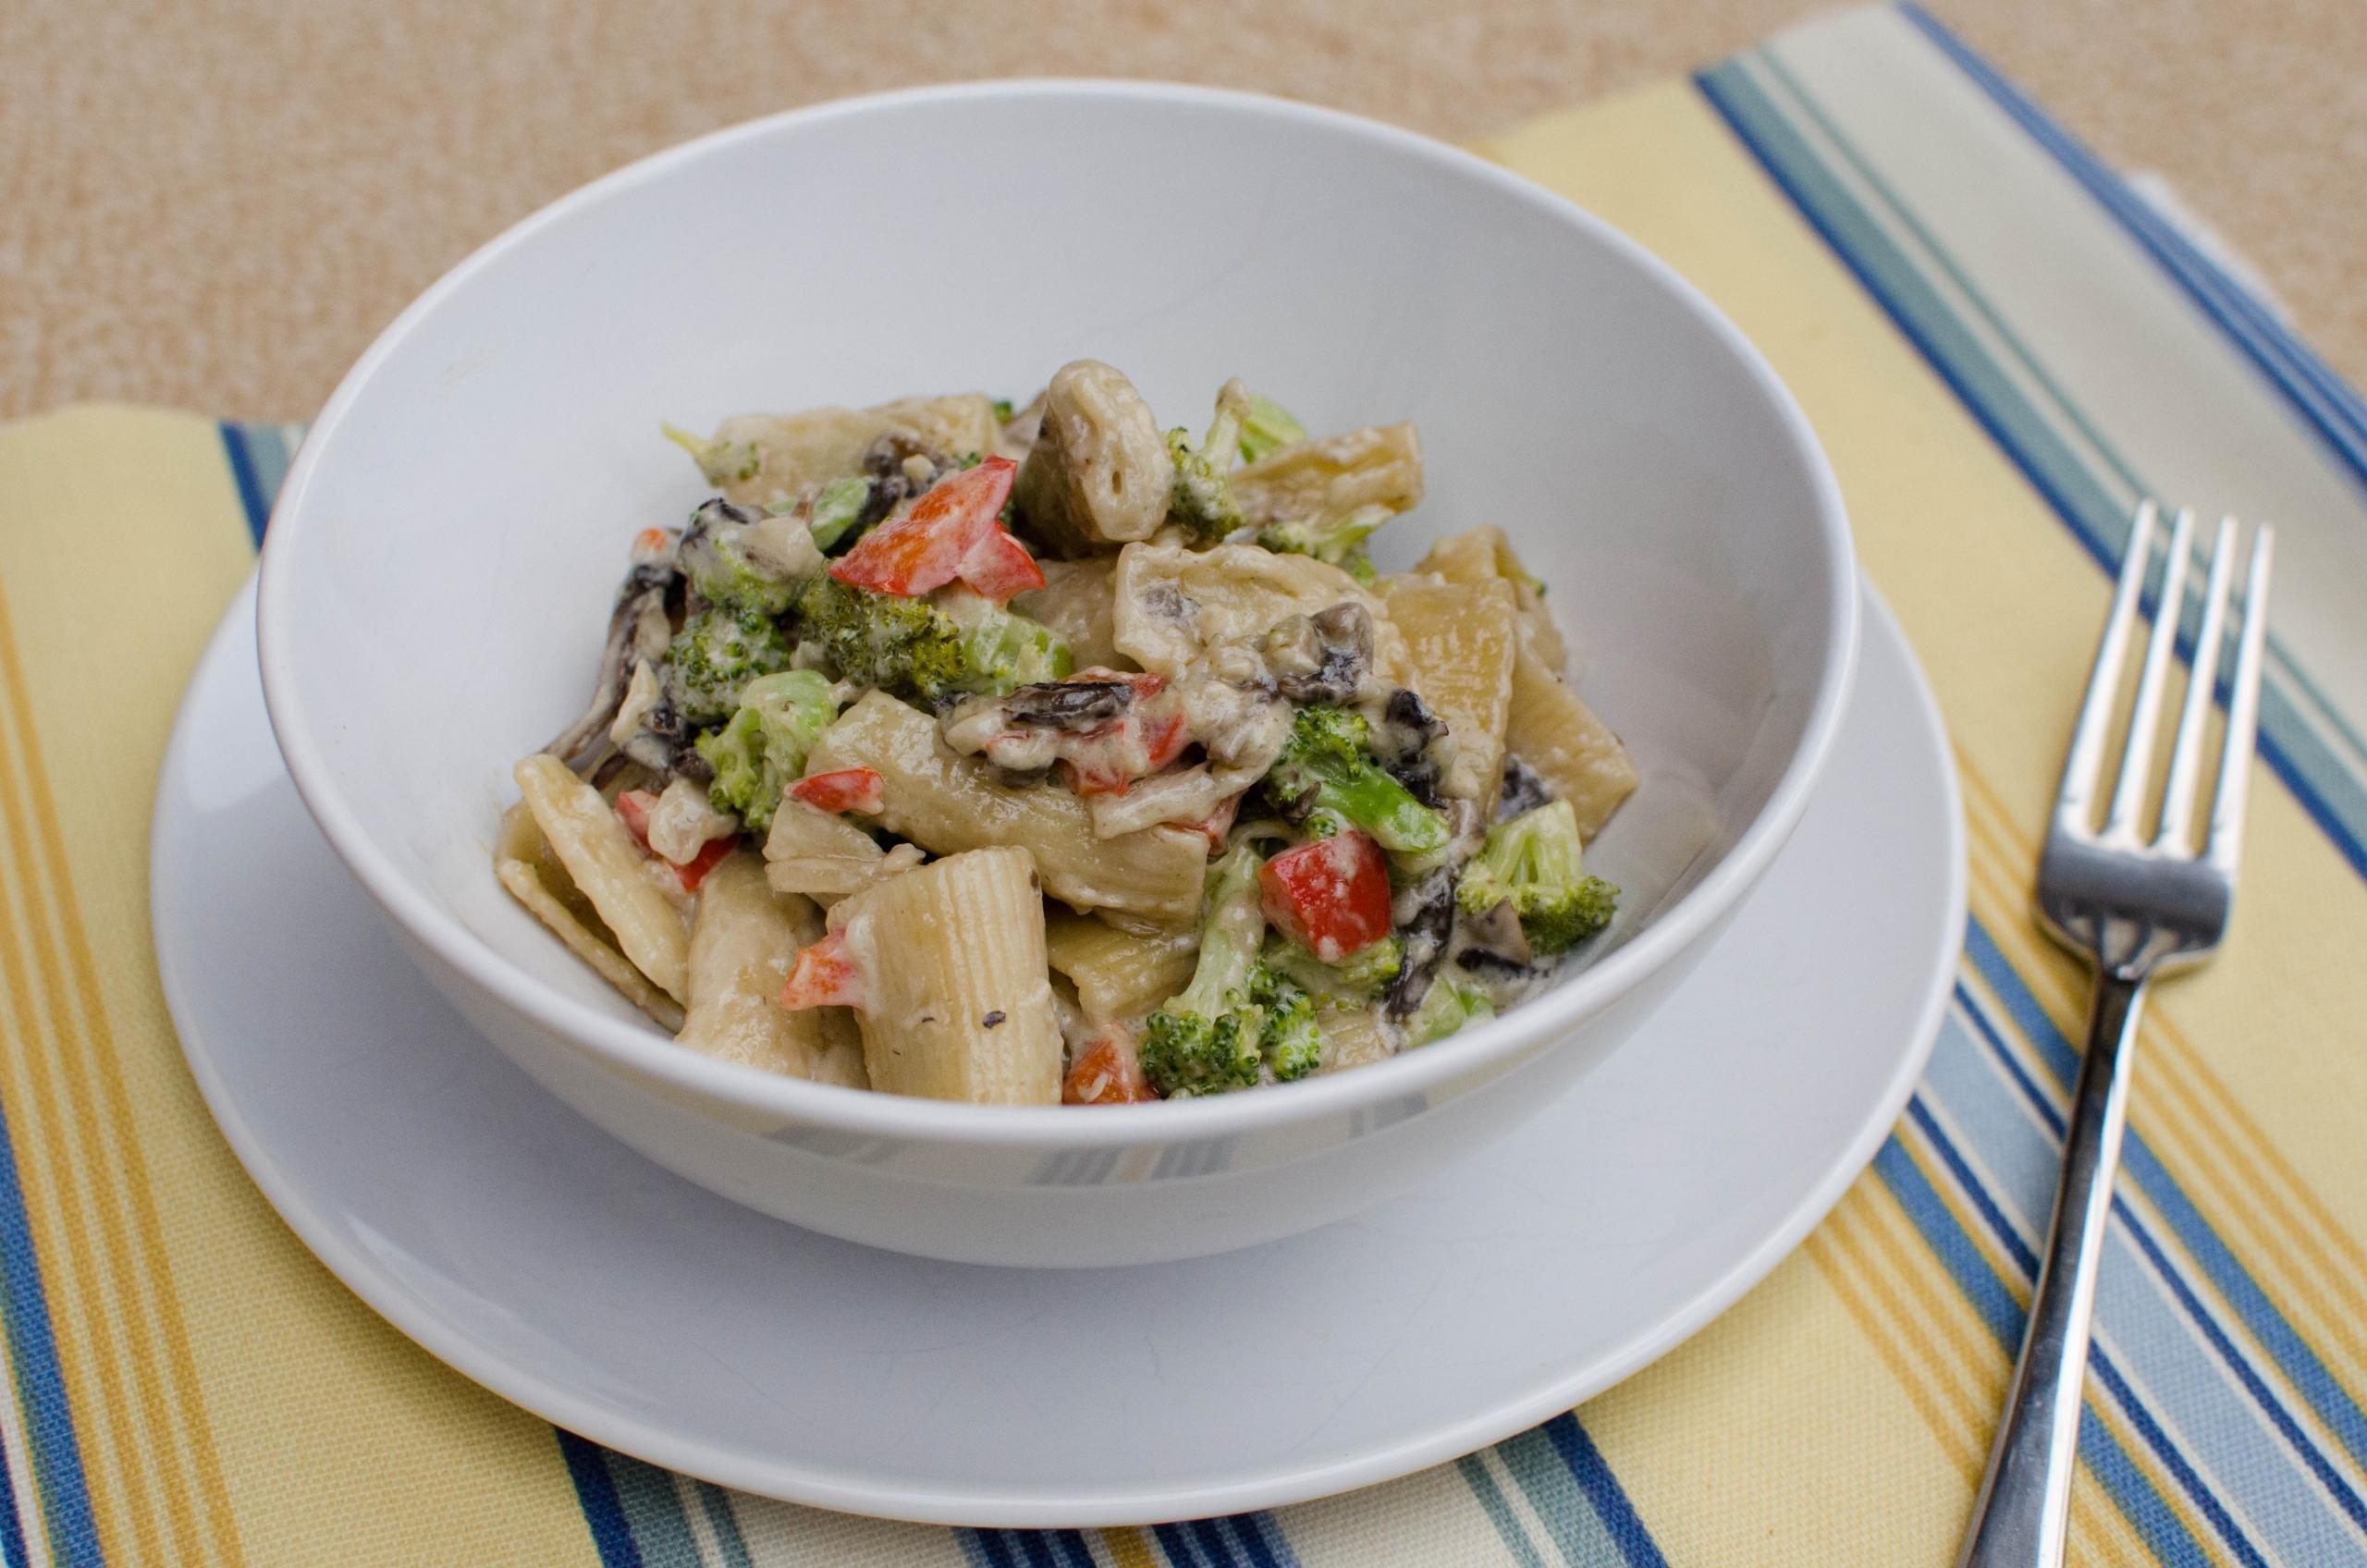 A bowl of Creamy Veggie Pasta